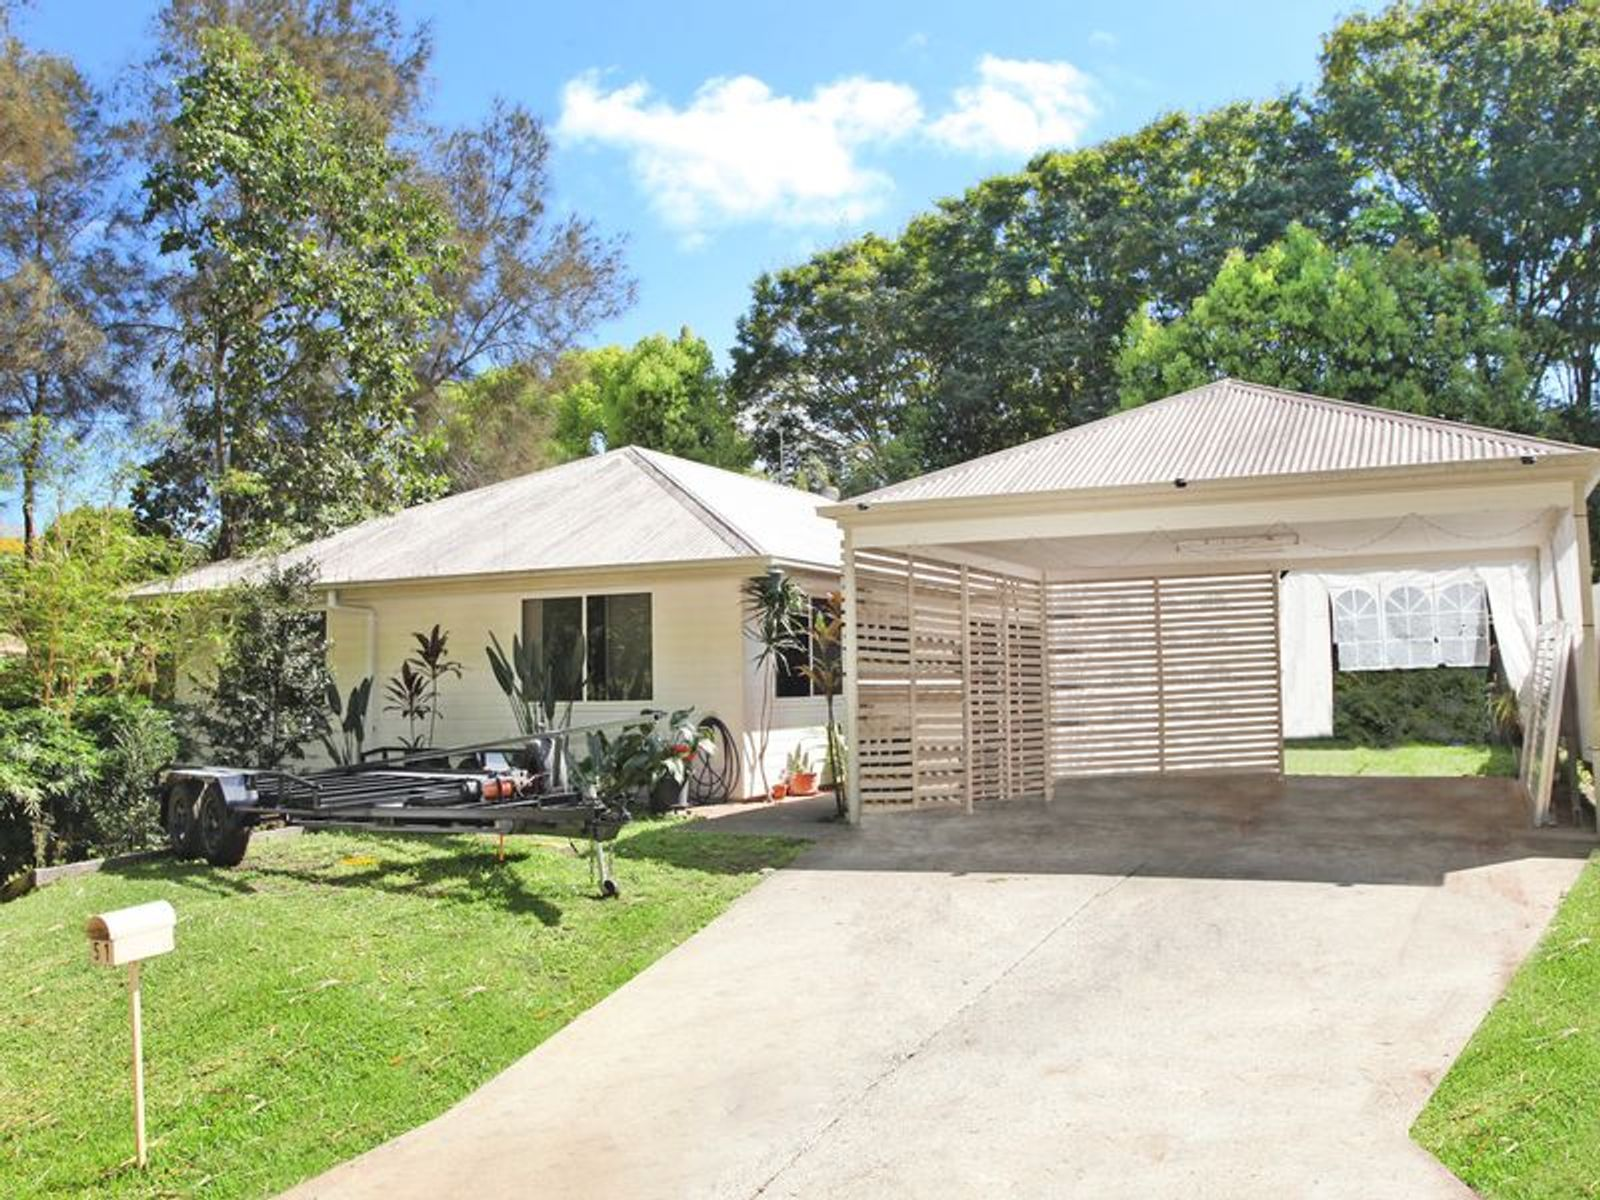 51 Elizabeth Street, Nambour, QLD 4560